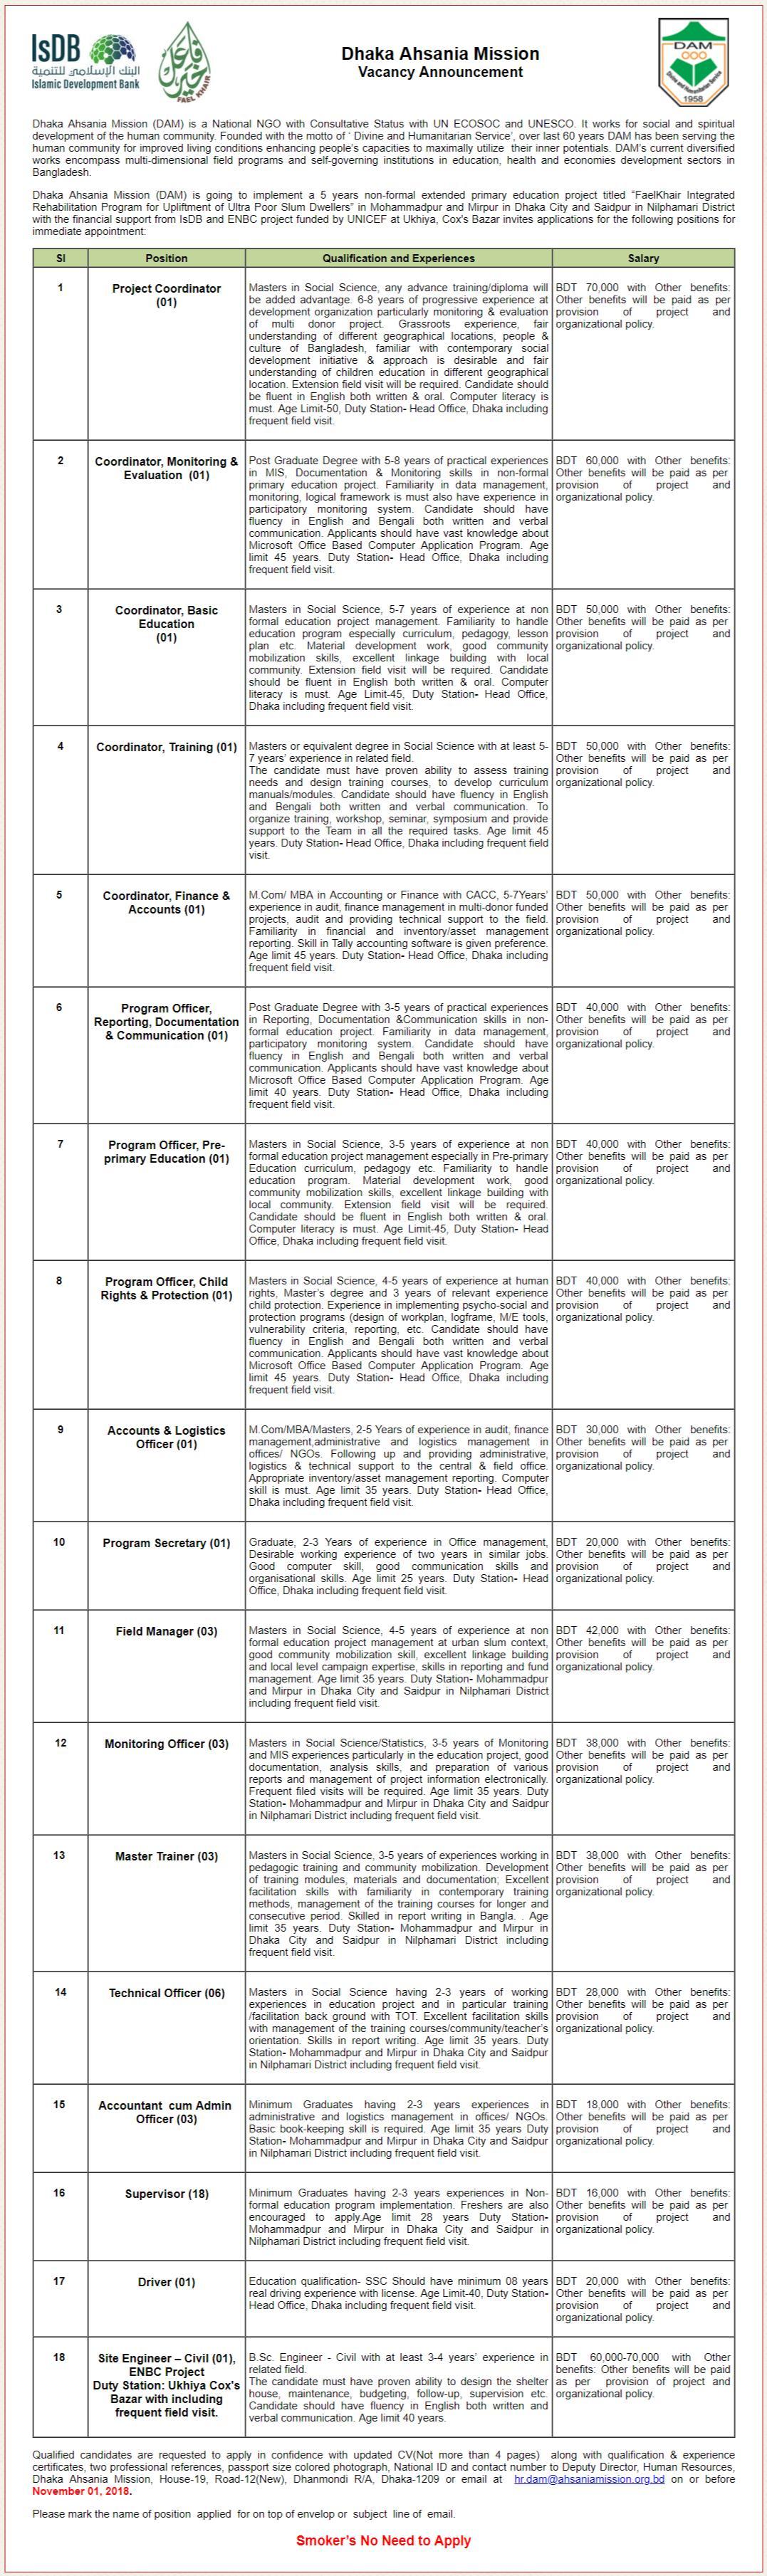 Dhaka Ahsania Mission Job Circular